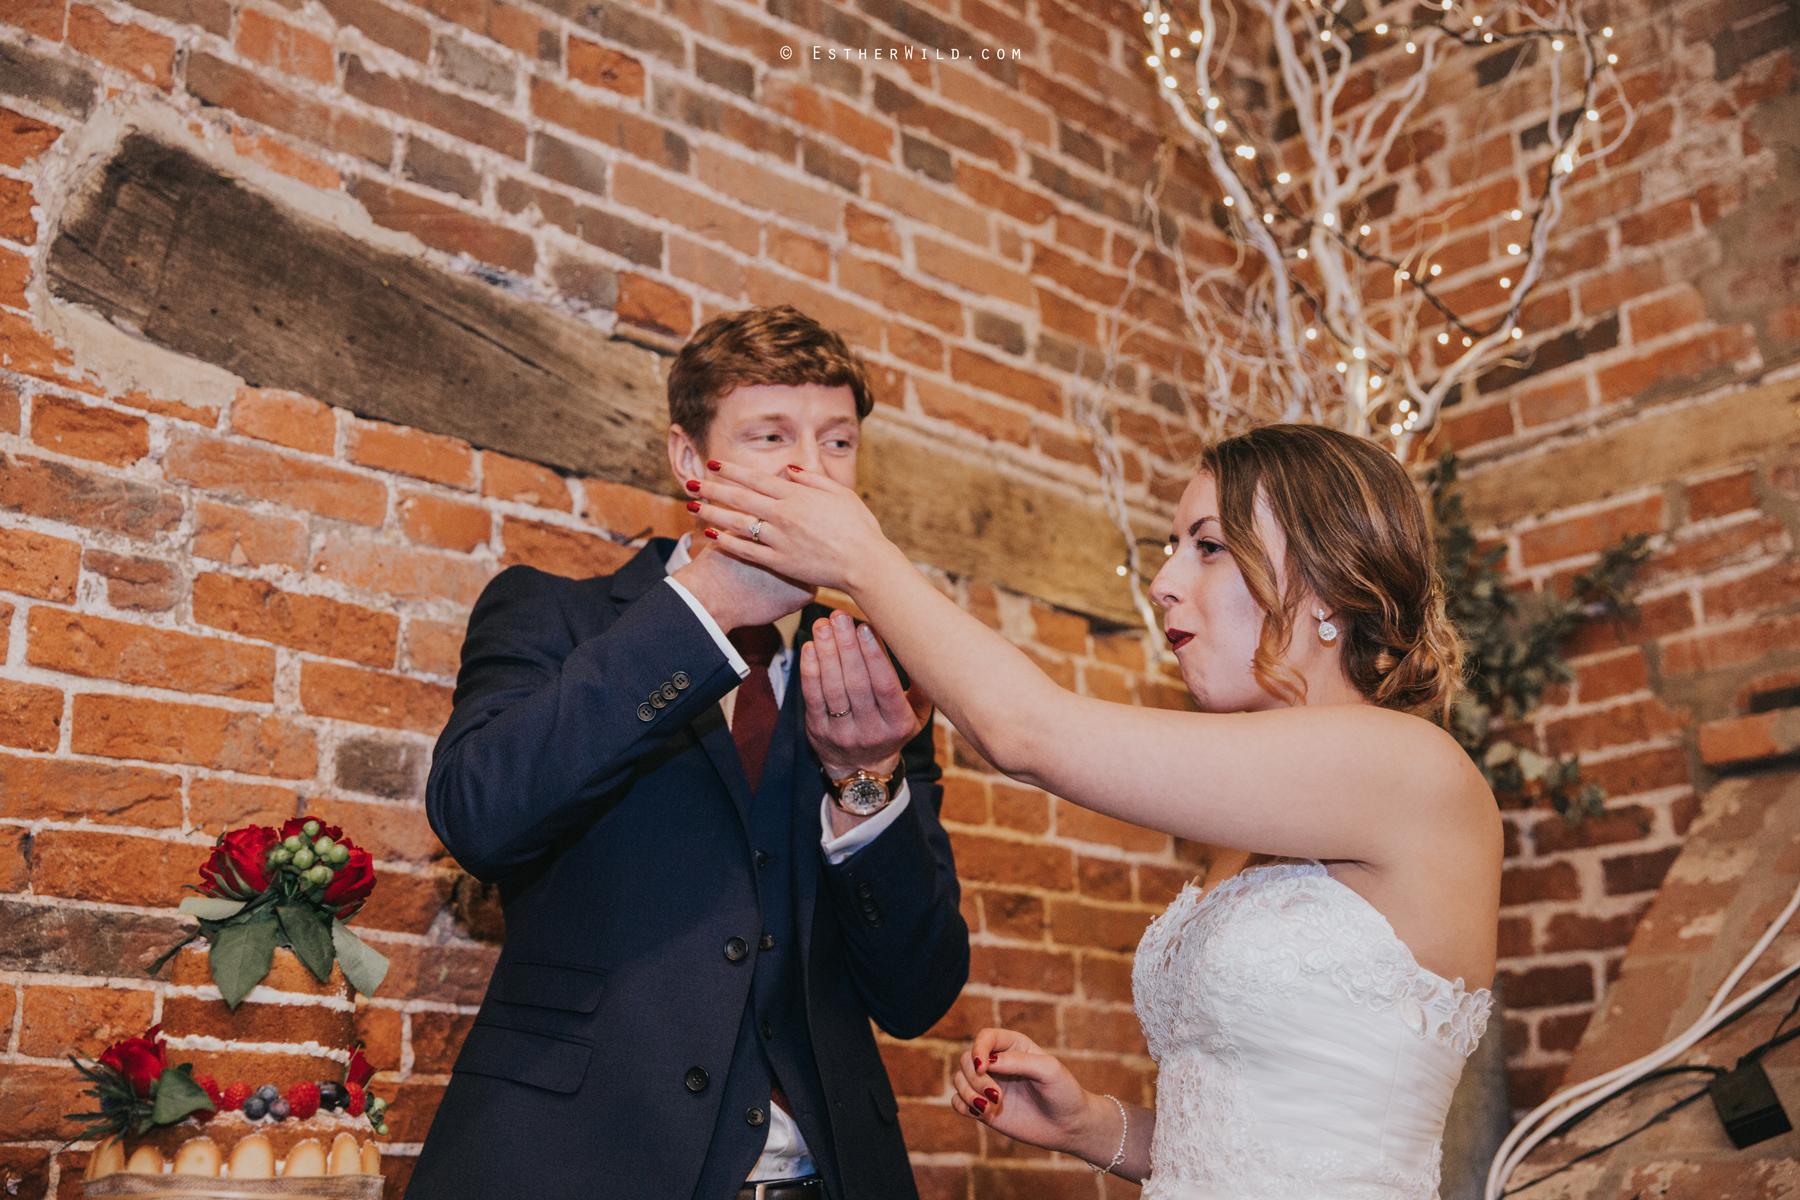 Glebe_Farm_Barn_Rustic_Norfolk_Wedding_Esther_Wild_Photographer_Copyright_IMG_2813.jpg